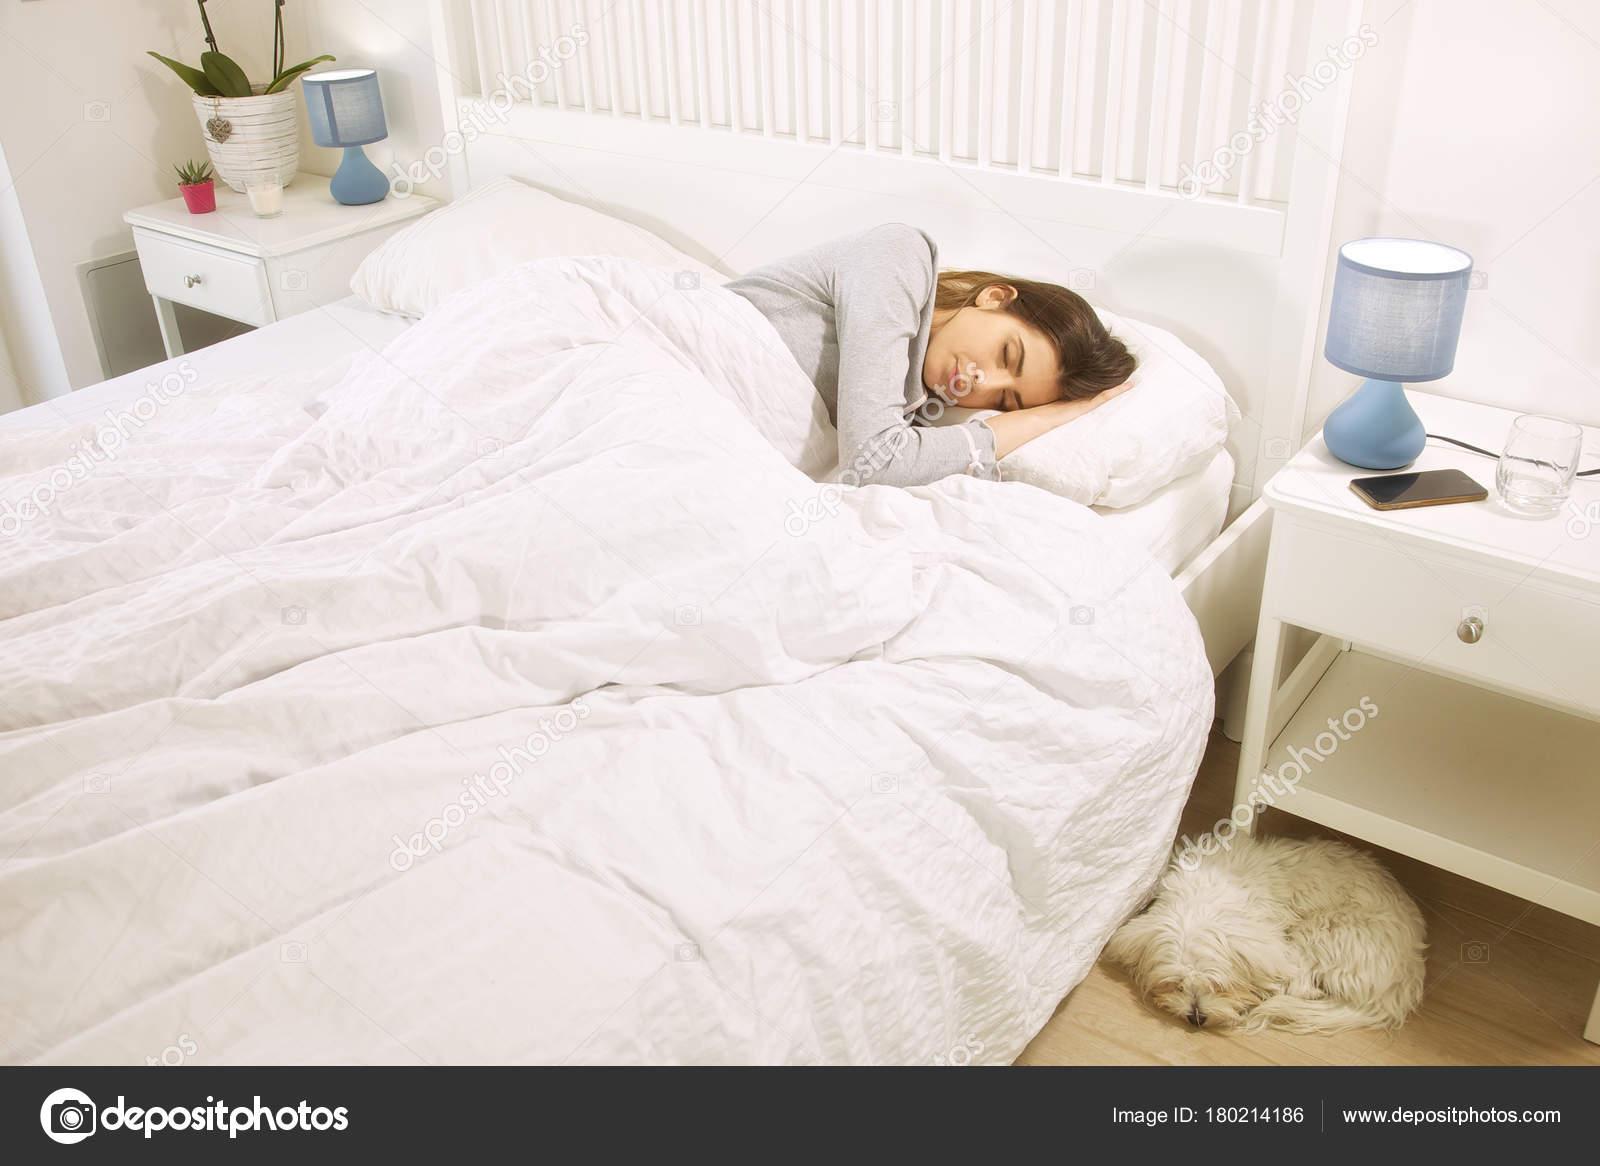 8468ccc62d46 Γυναίκα ύπνο στο κρεβάτι δίπλα στο σκύλο ευτυχισμένο — Φωτογραφία ...